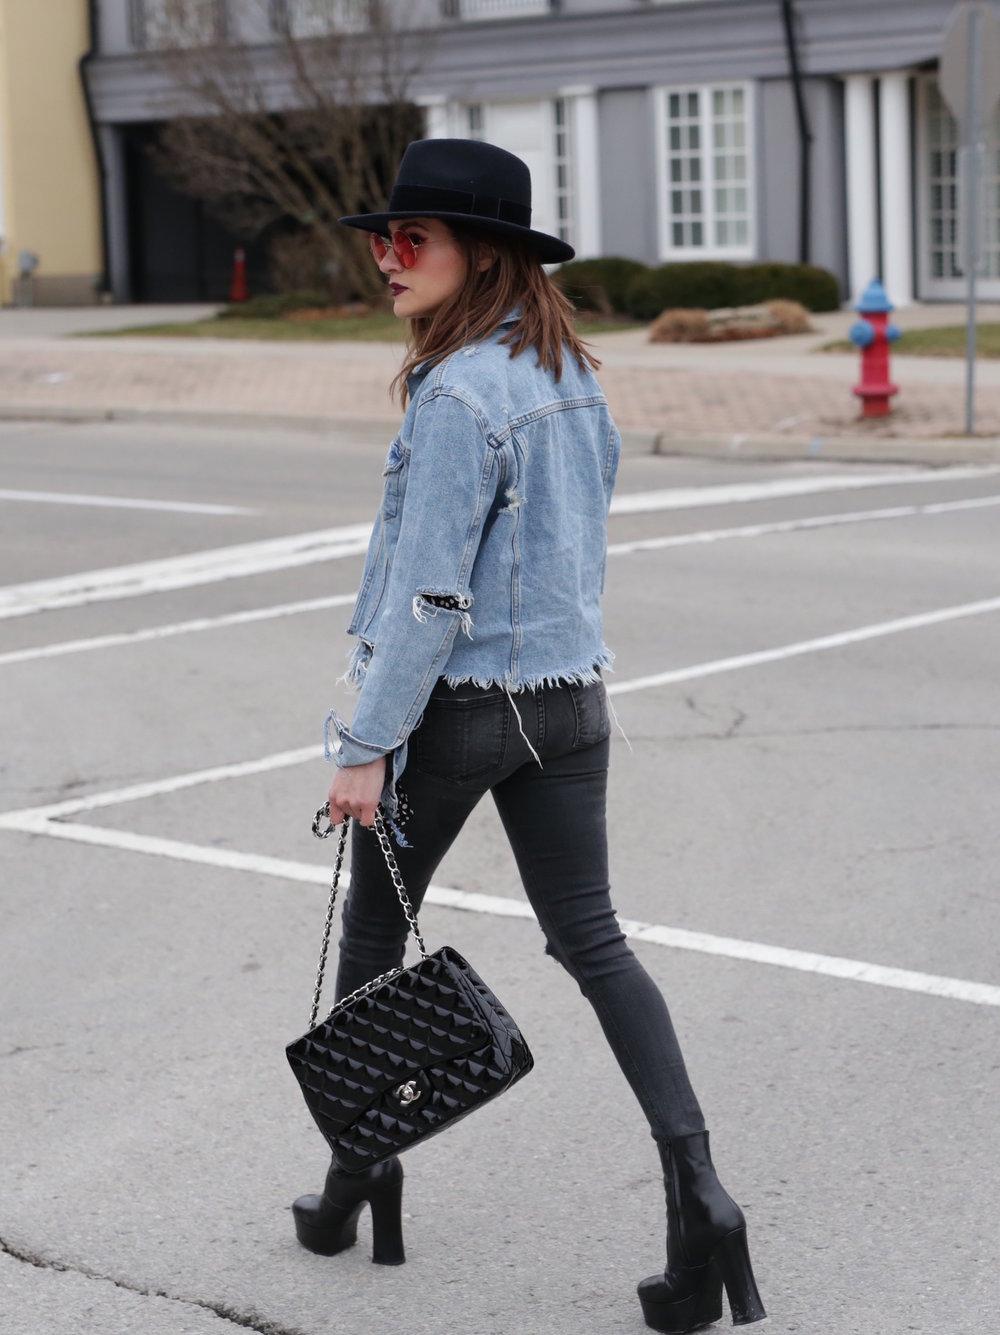 Patent leather Chanel jumbo bag, Saint Laurent platform boots, shredded denim jacket street style - woahstyle.com_7464.JPG